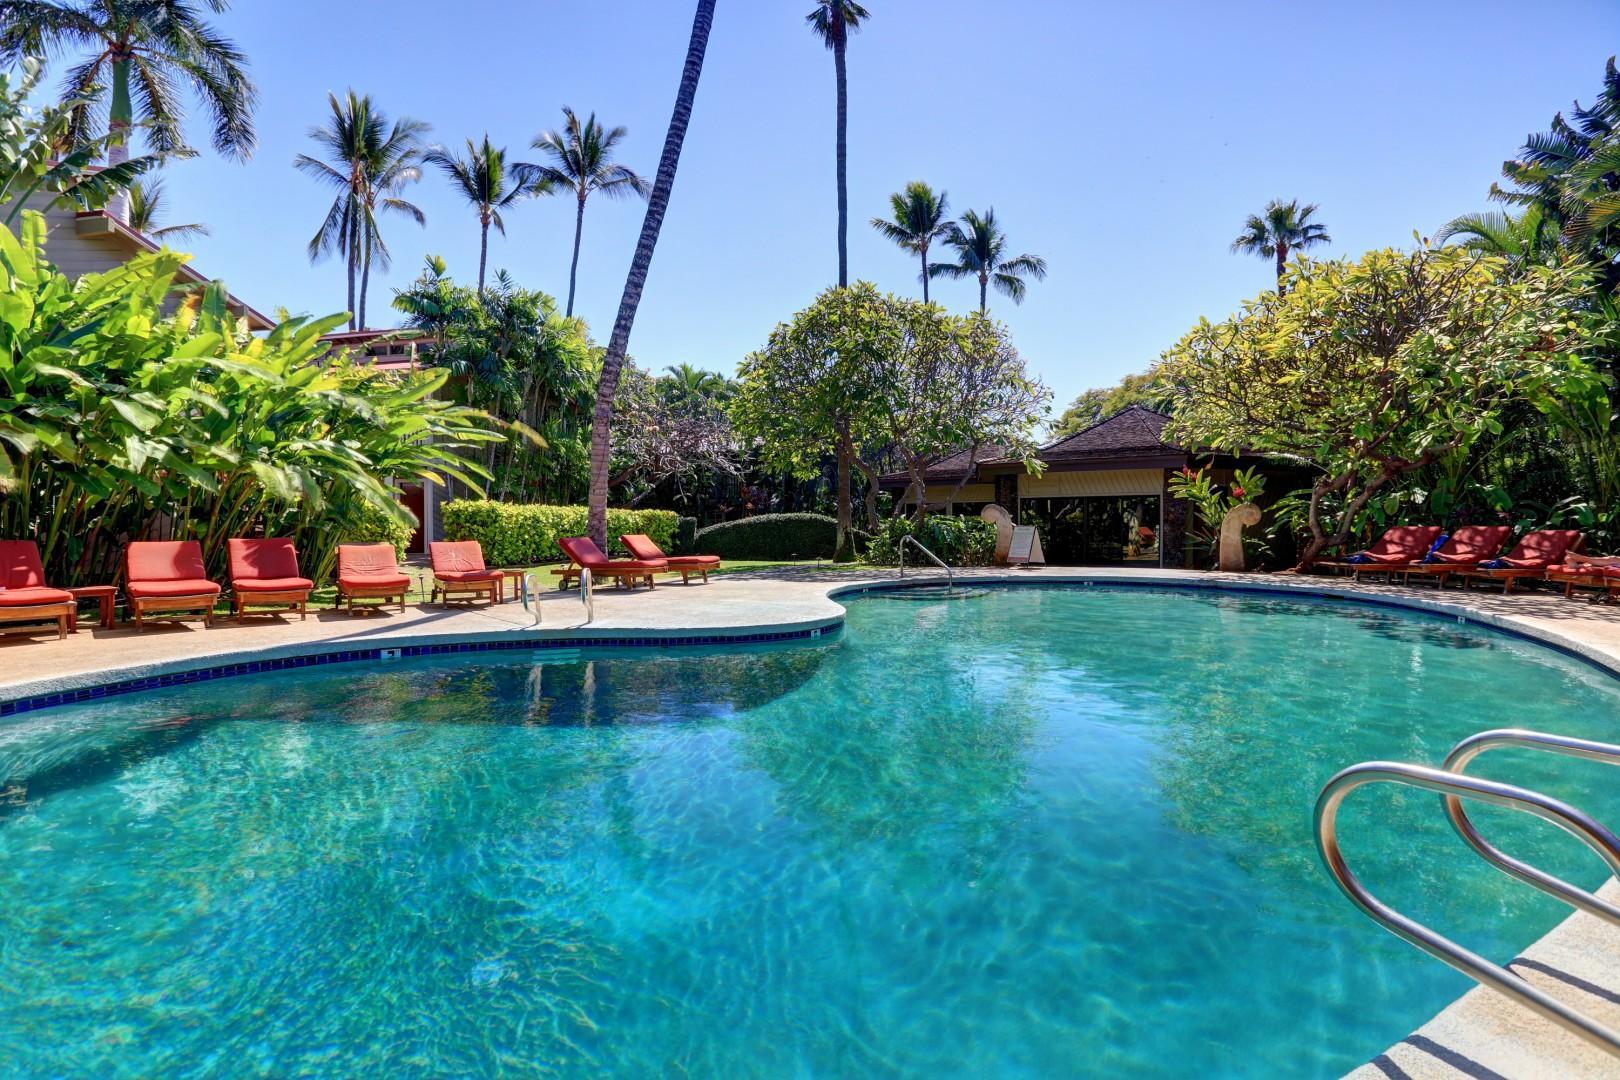 Multiple pools at Aina Nalu resort